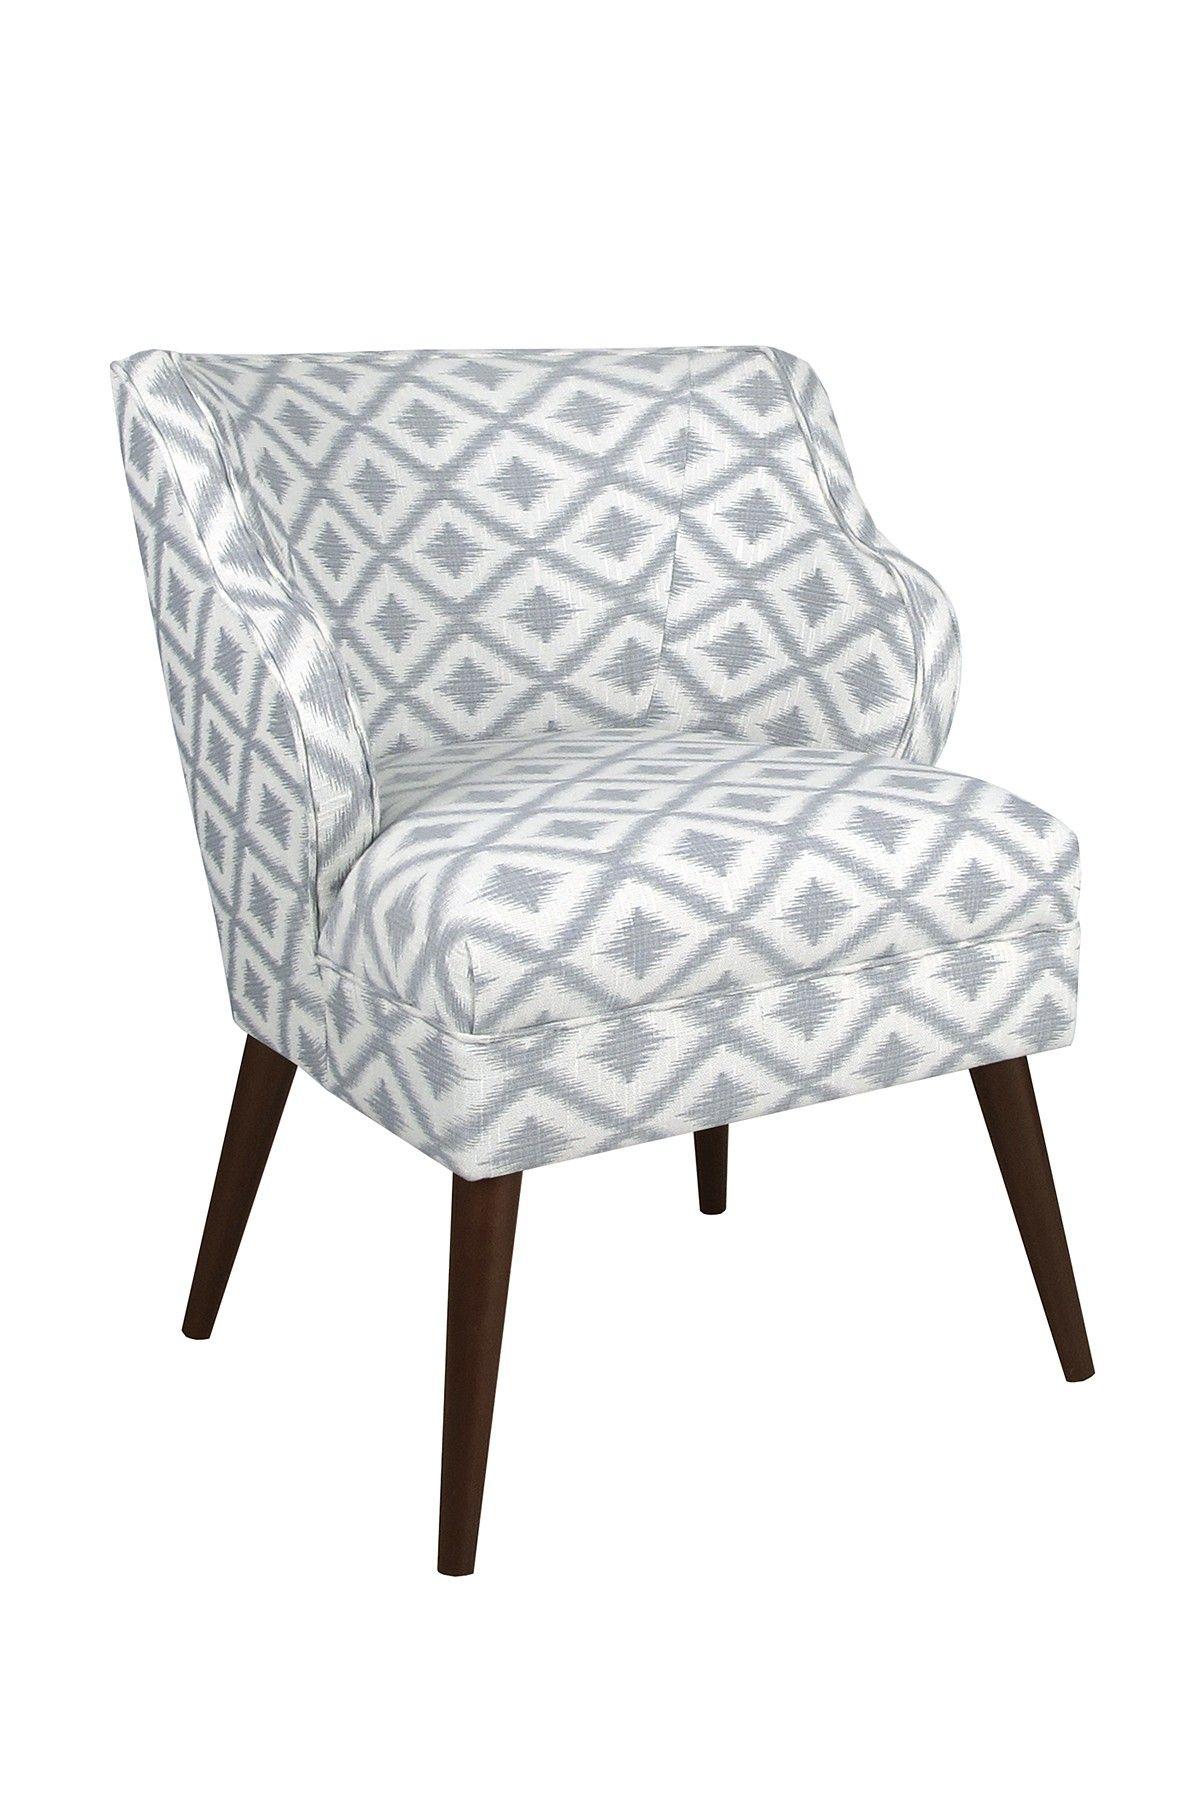 Modern Chair Ikat Fret Pewter Teamhrycyk Myitworks Com Www